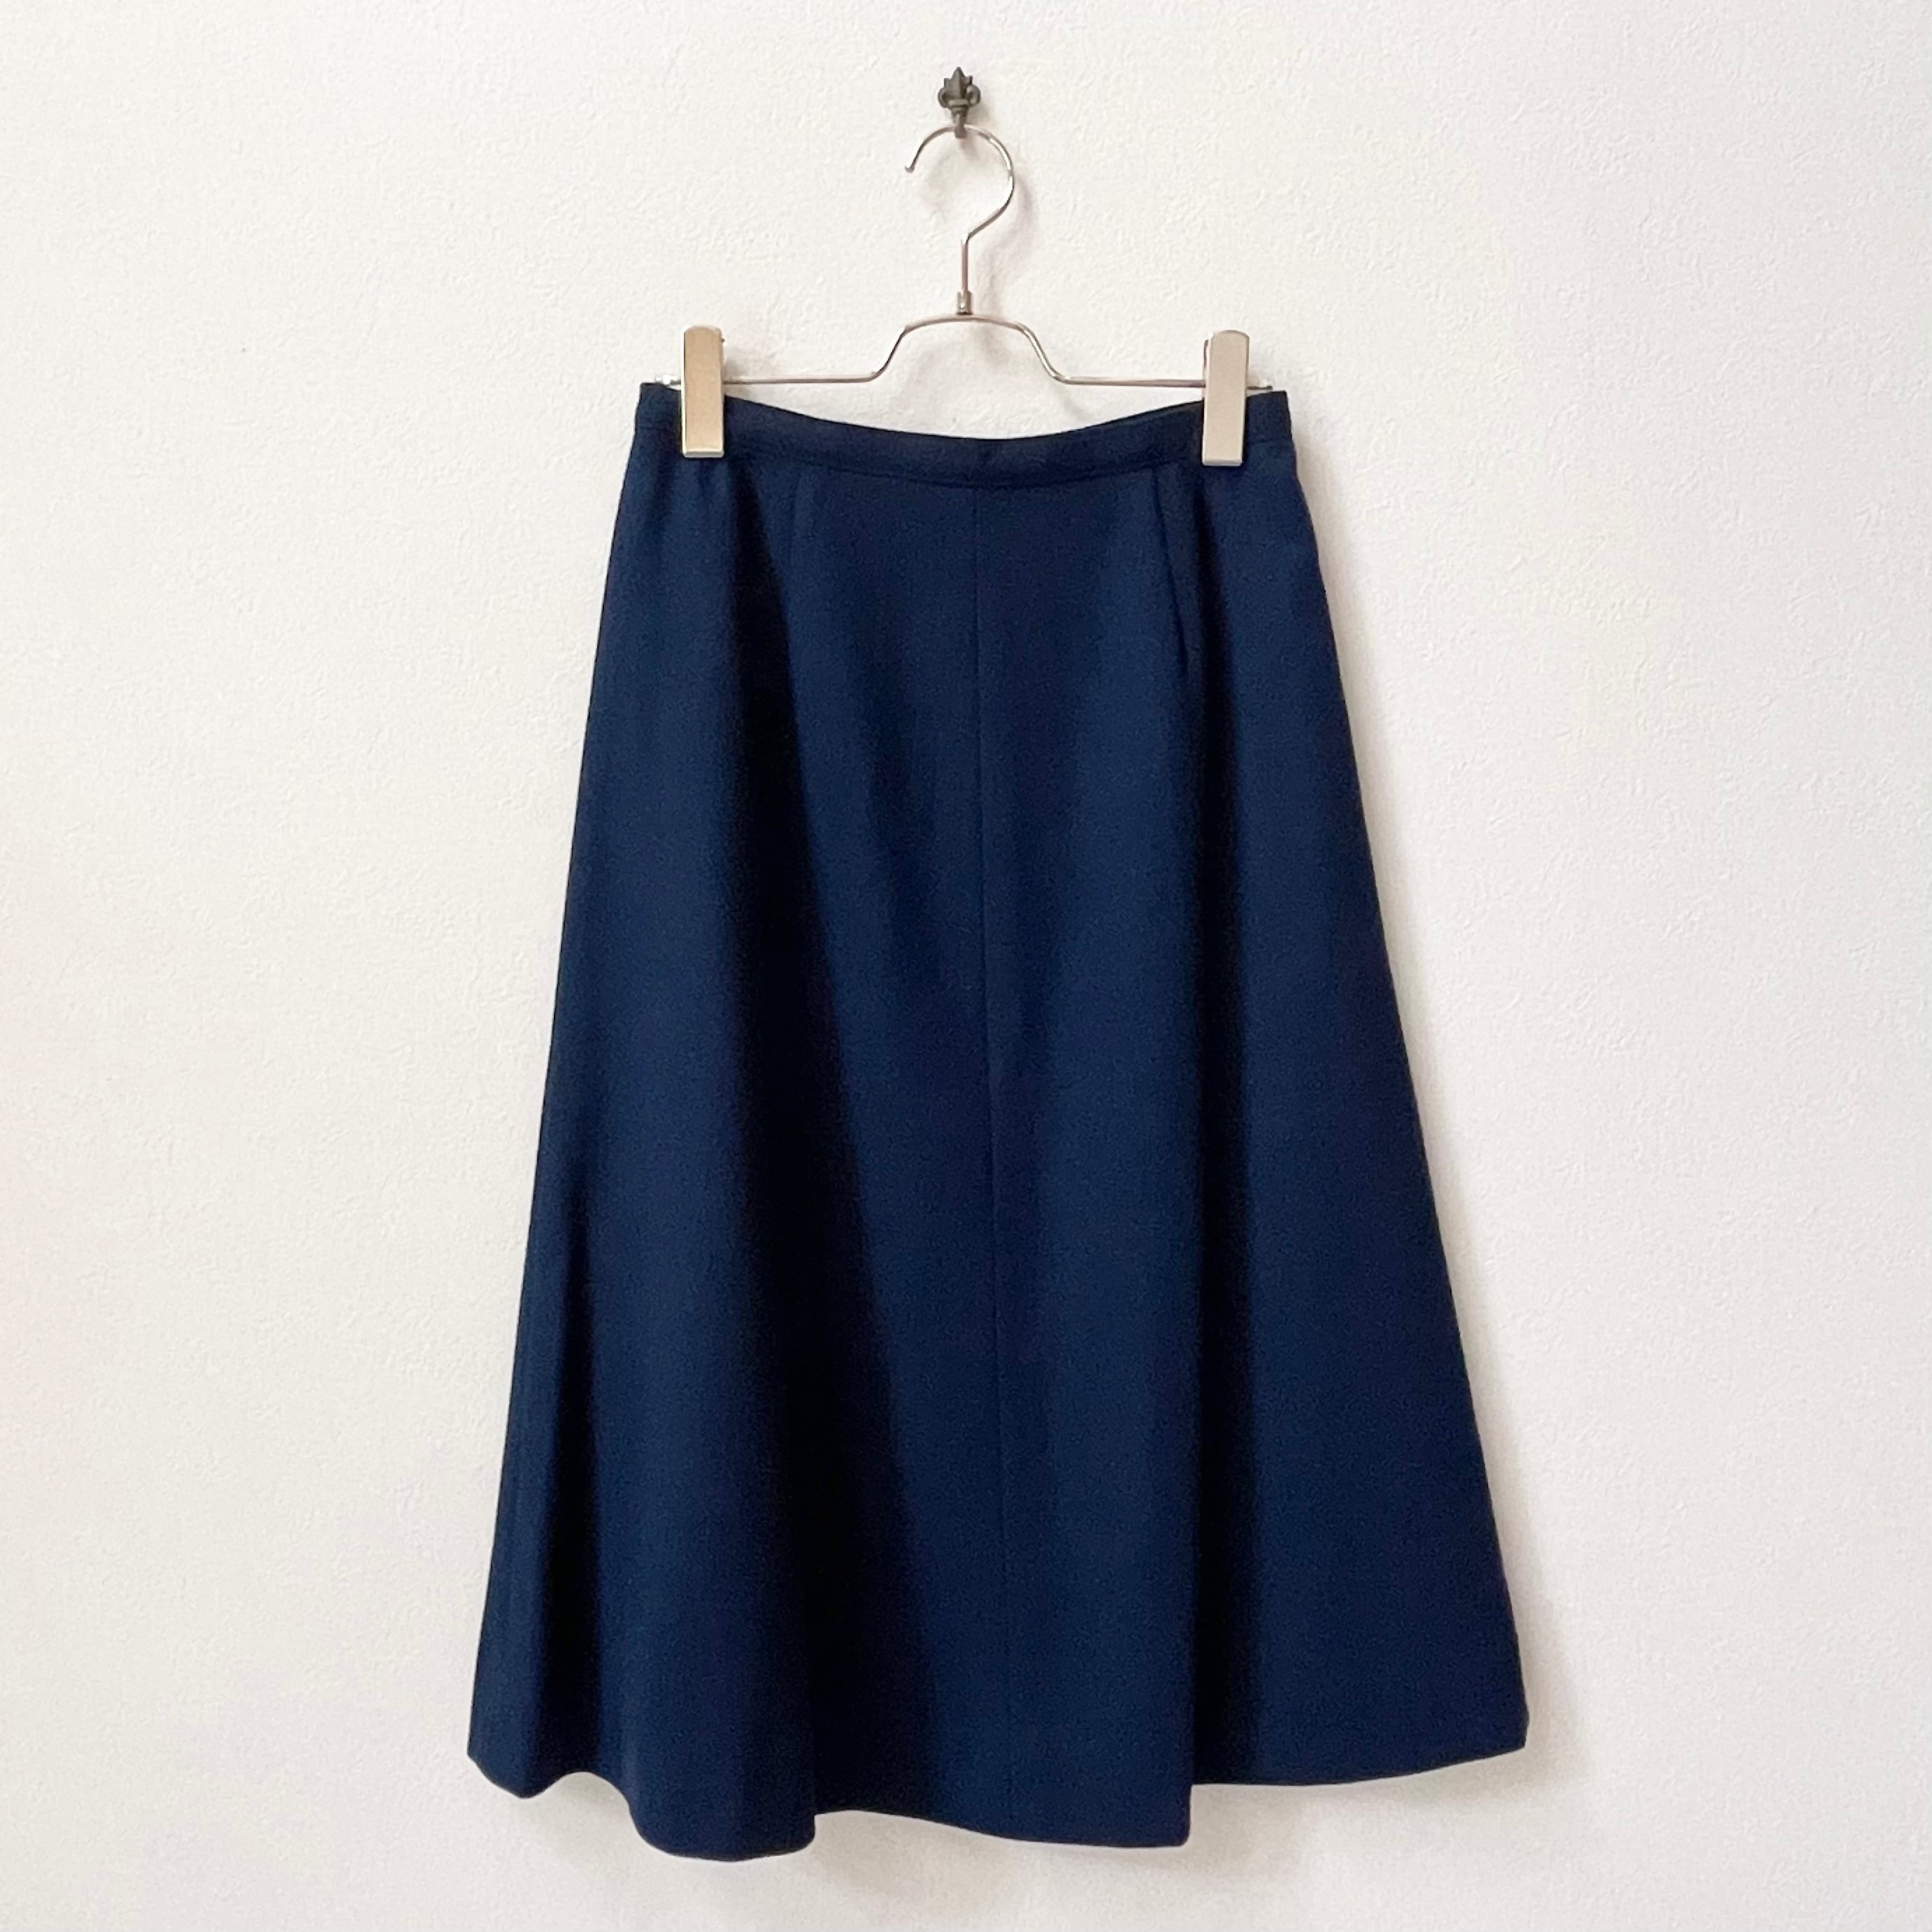 PENDLETON ペンドルトン 70年代  USA製 ウール フレアスカート 古着 日本M